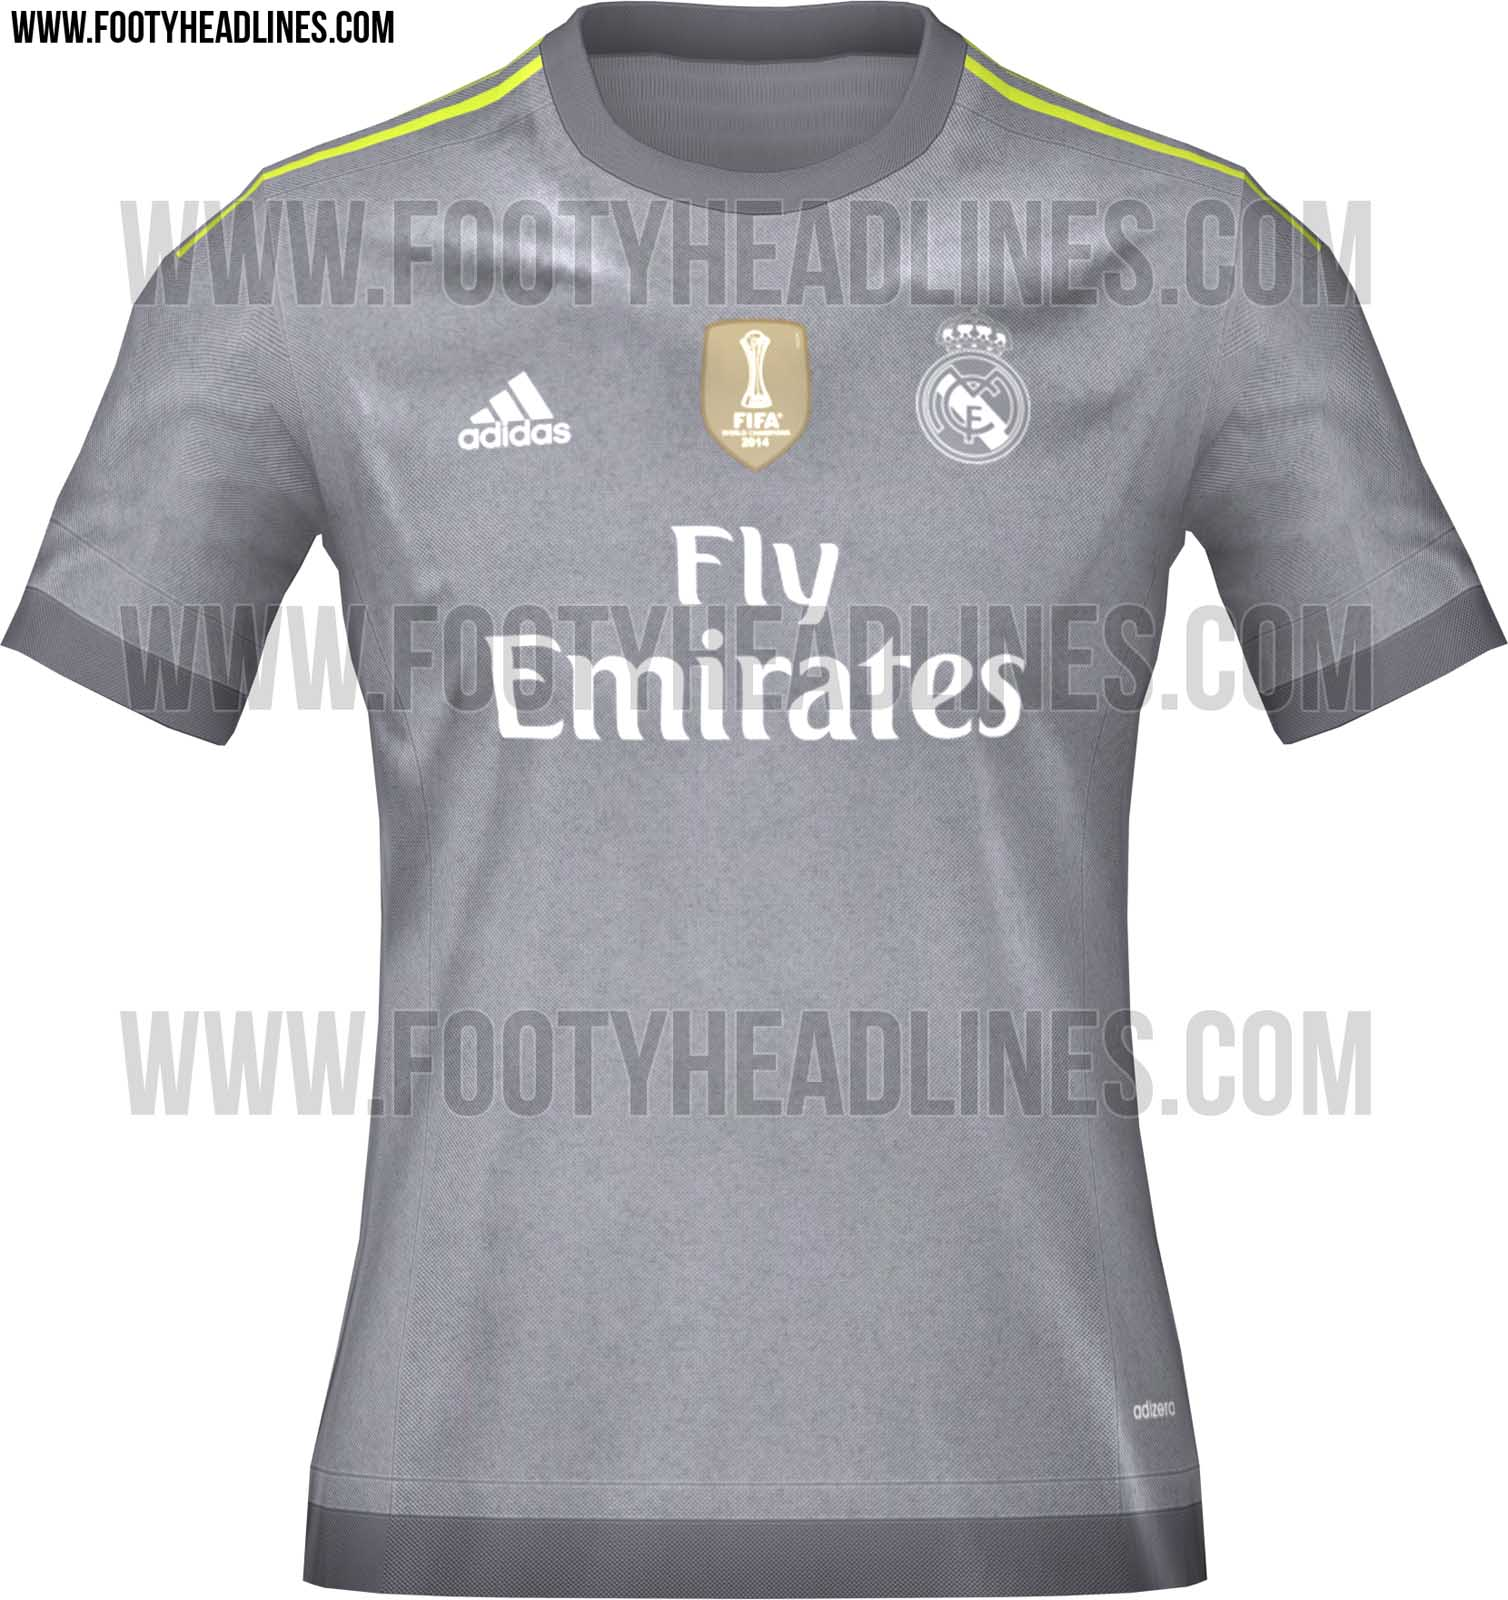 6a3a2d8b200f5 Las camisetas del Real Madrid de la temporada 2015-2016 - SPORTYOU